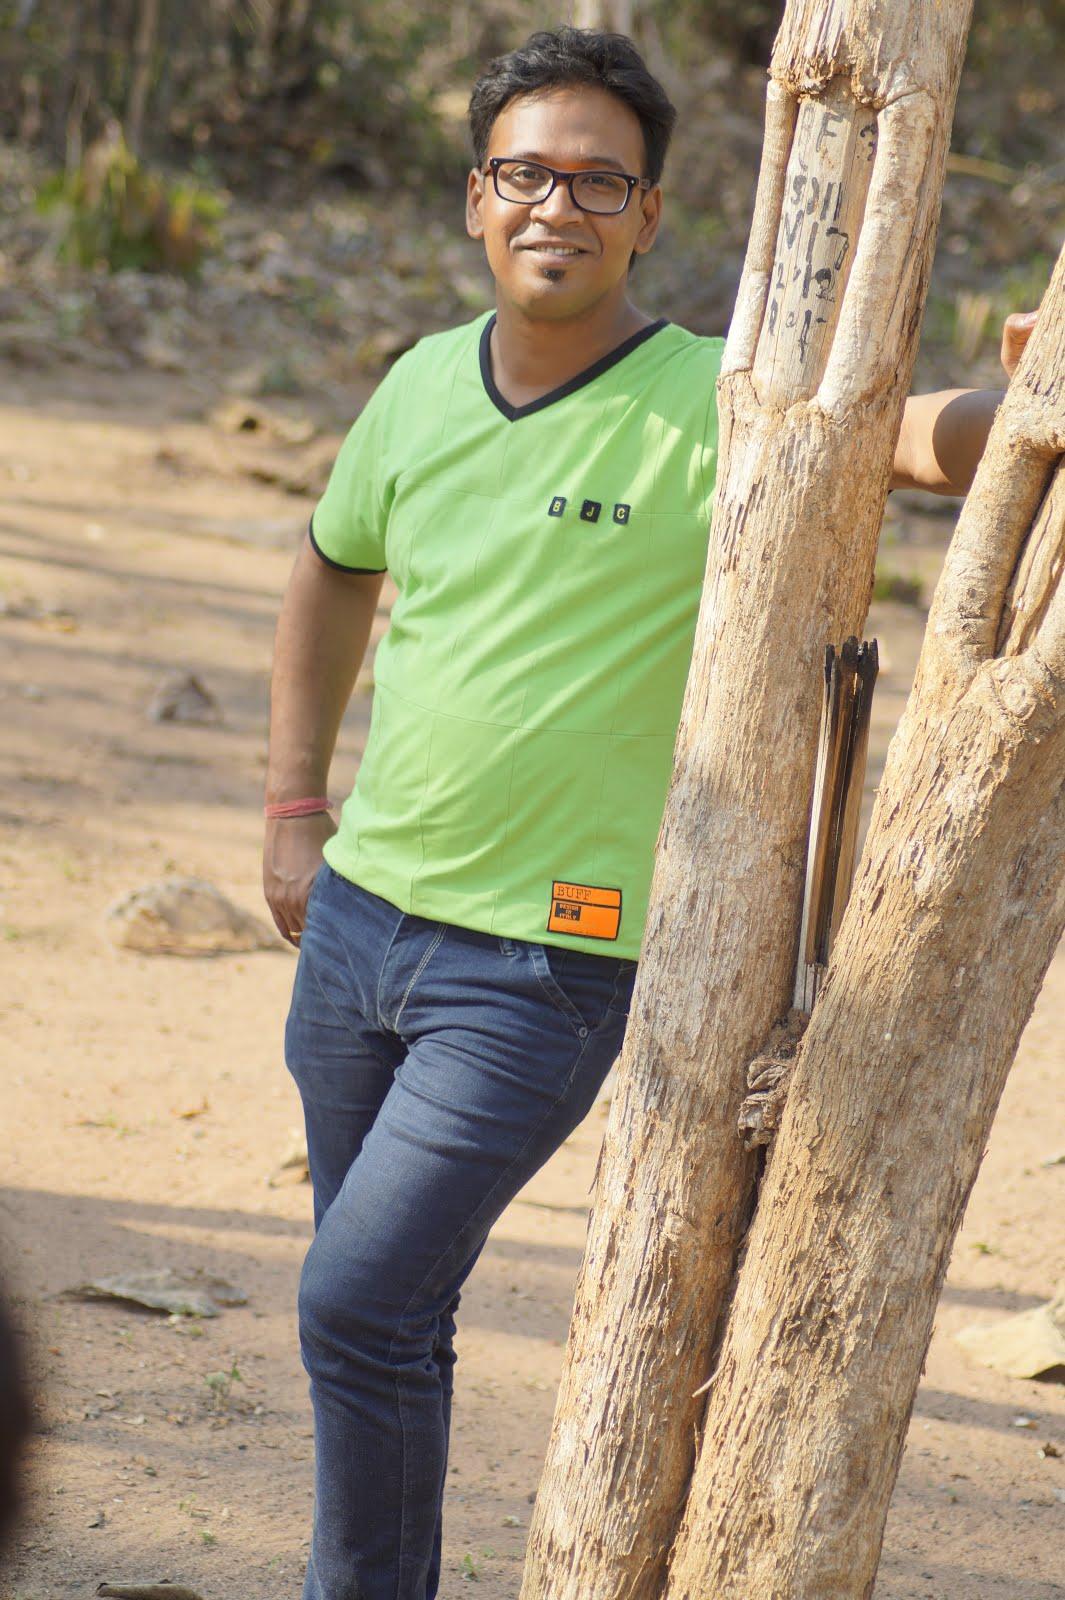 Xxx tamil com